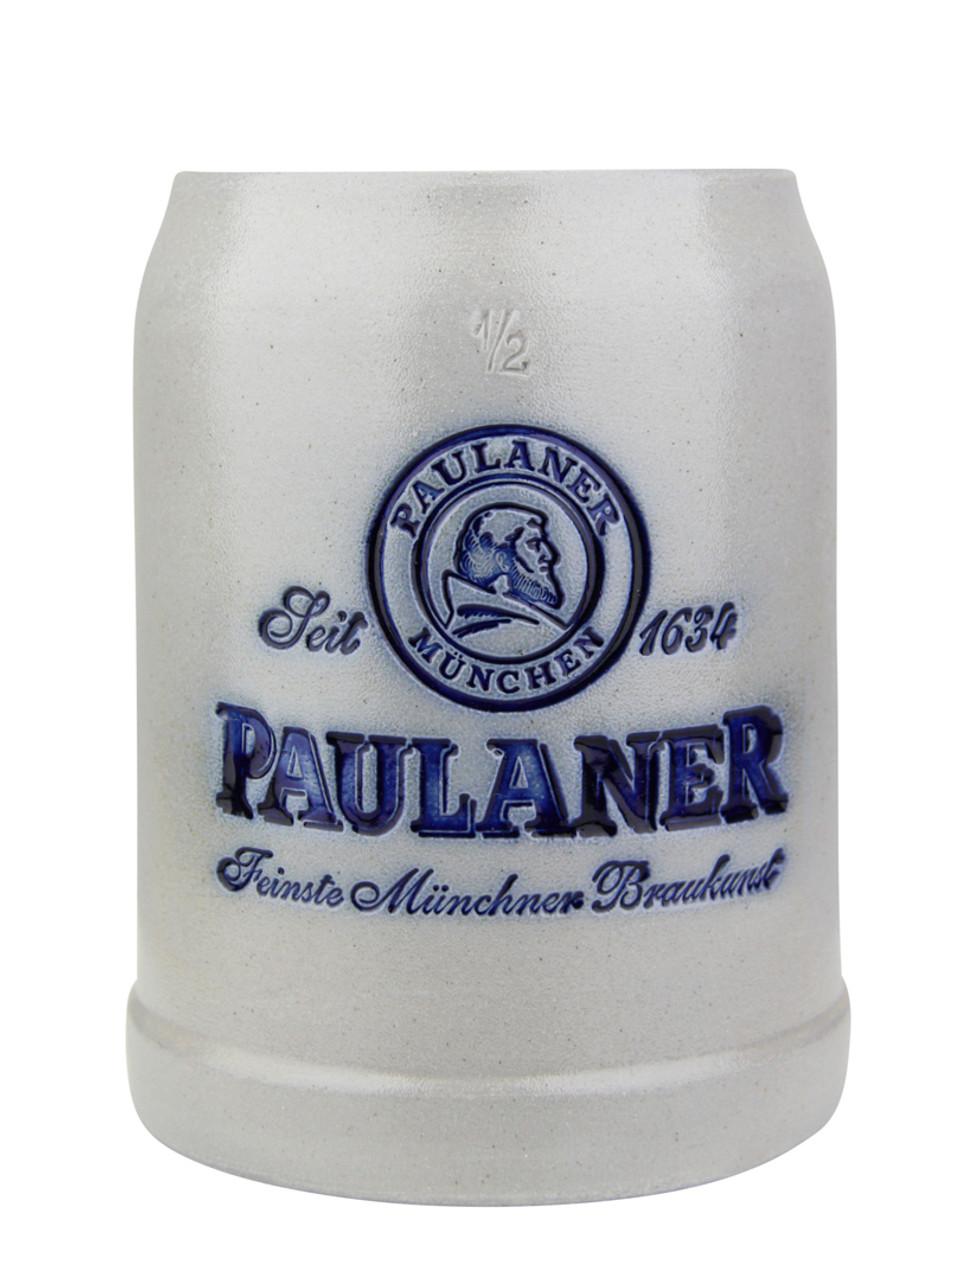 Paulaner Brewery 0.5 Liter Salt Glaze Stoneware Beer Mug